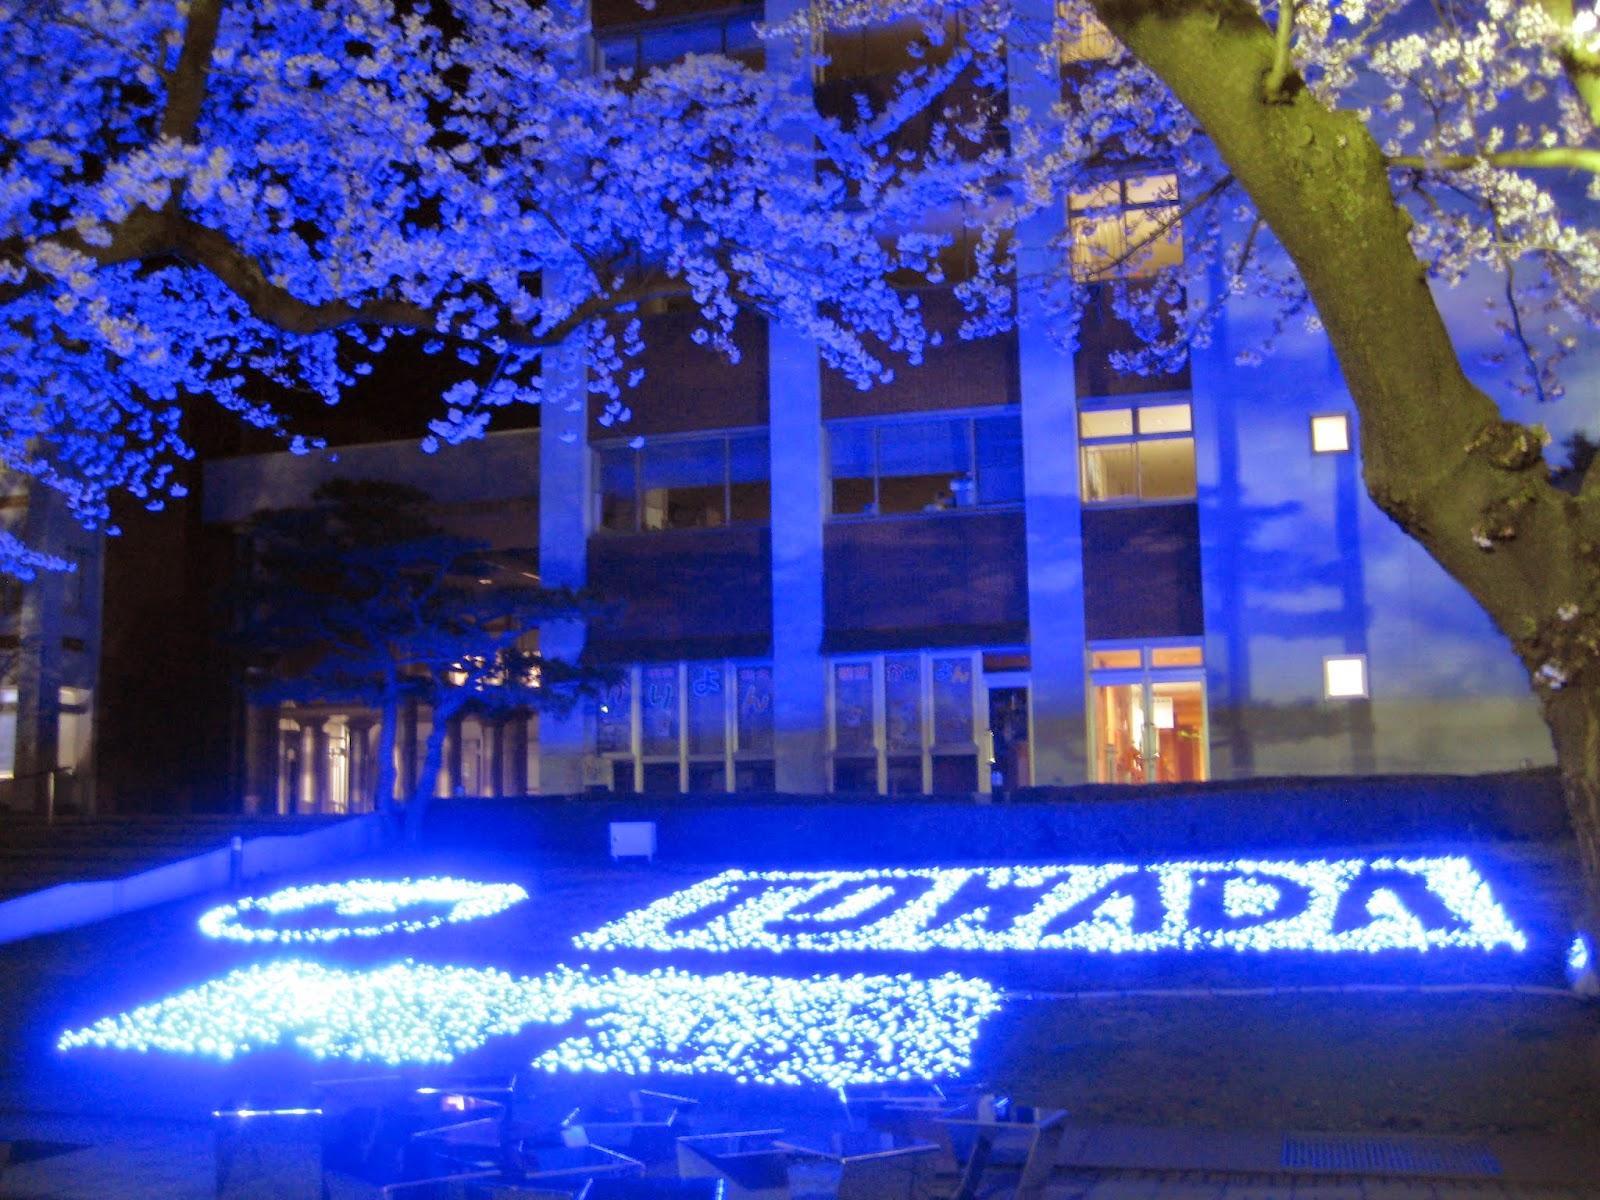 Night-Time Sakura Light Up Towada Spring Festival 夜桜ライトアップ 十和田市 春まつり